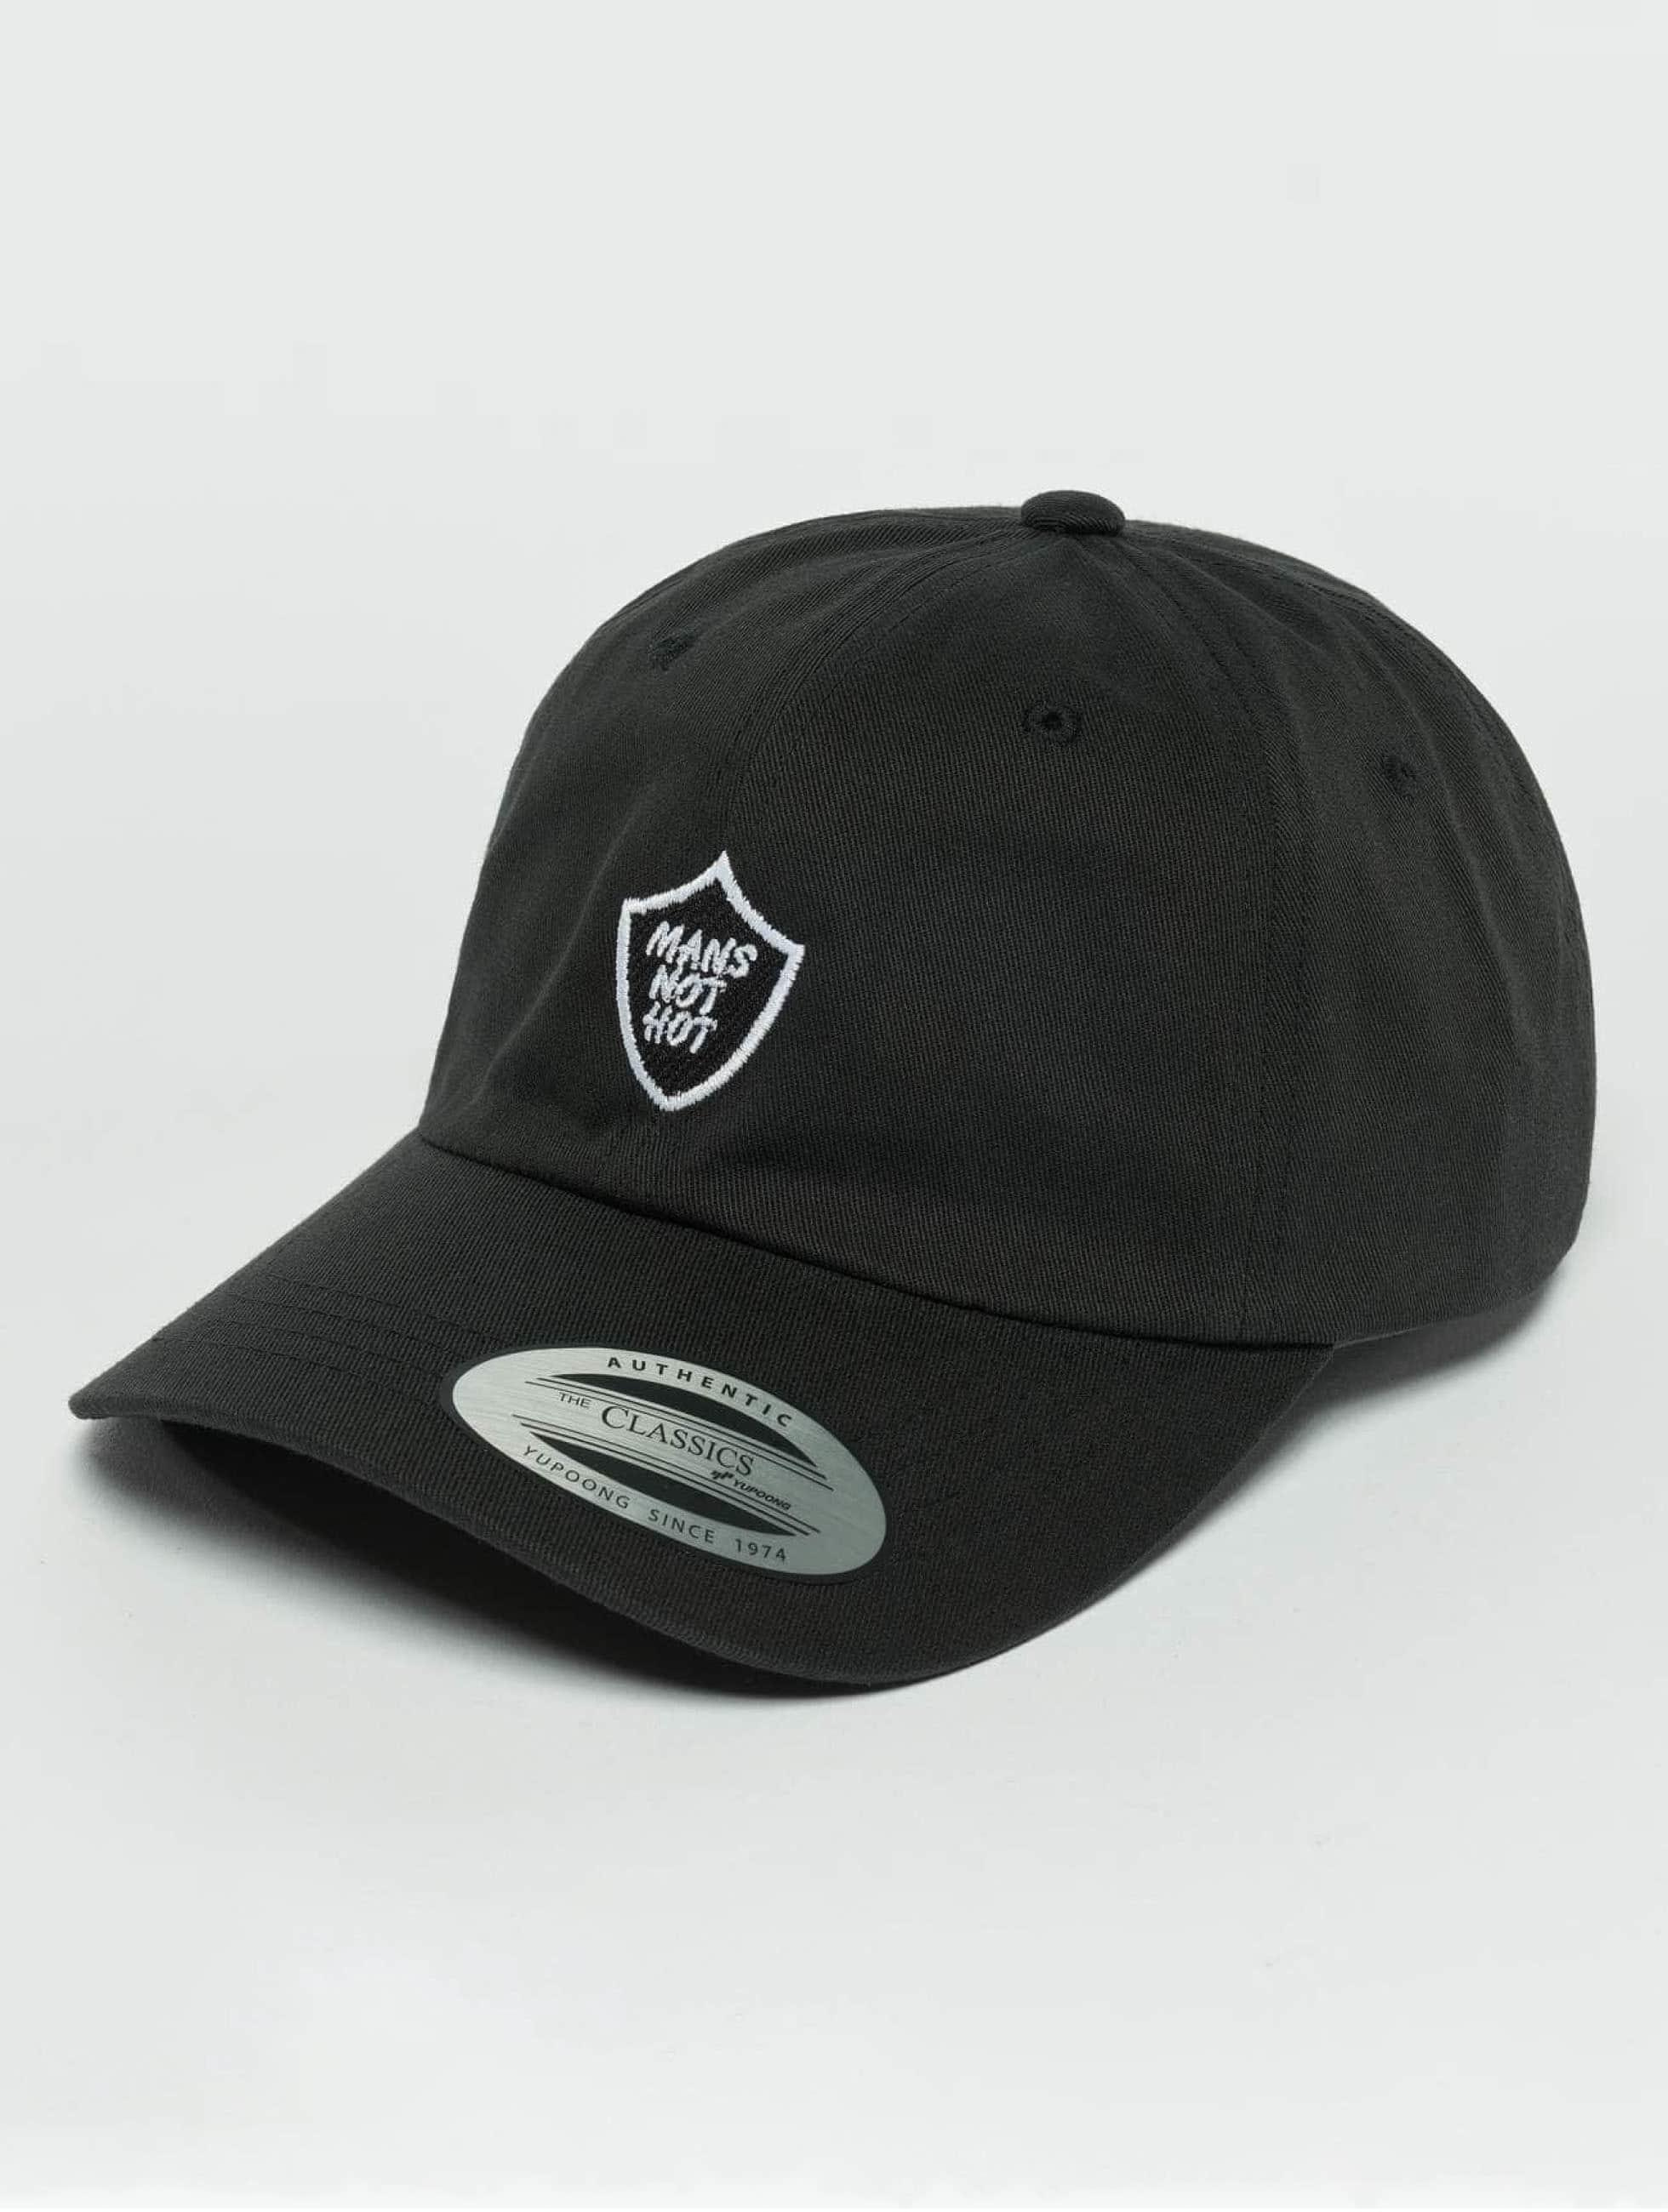 TurnUP Snapback Caps Not Hot čern